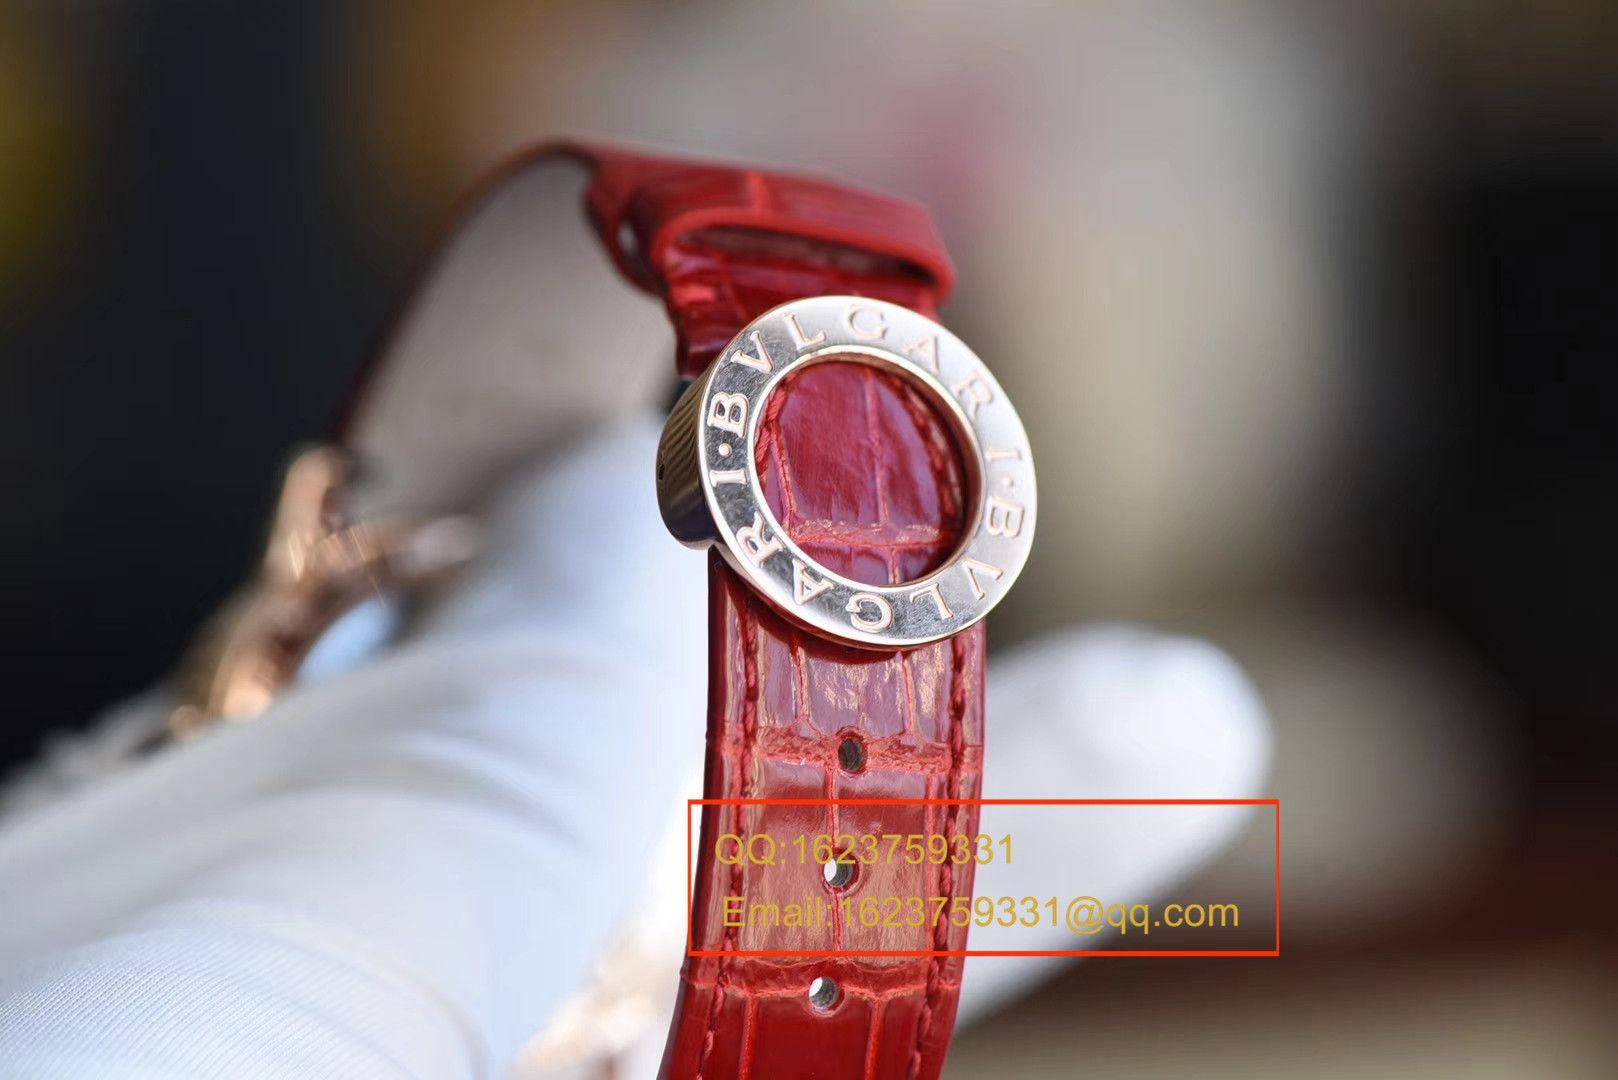 【TF厂1比1超A高仿手表】宝格丽BVLGARI∙BVLGARI系列102343 BBLP37SDGDLTB腕表